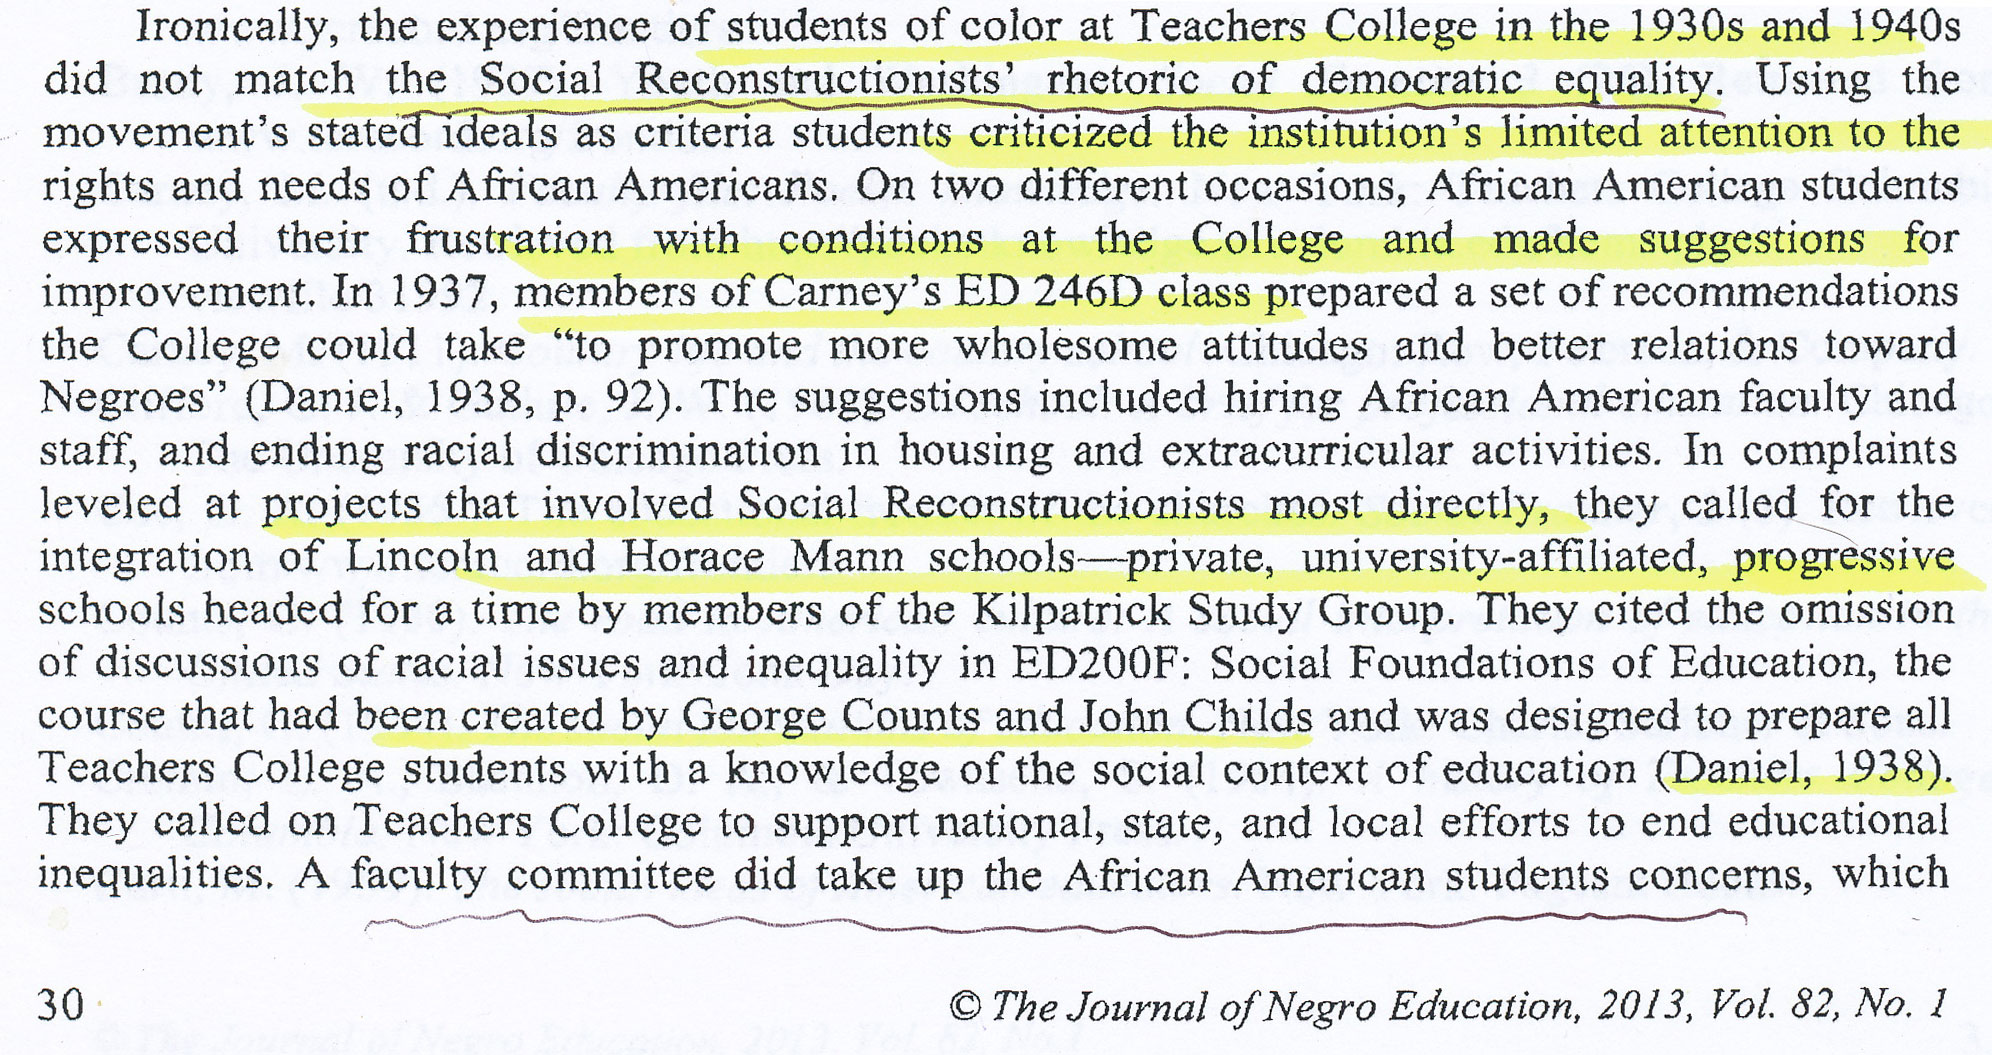 Figure 7: From: McCarthy & Murrow (2013, p. 30)